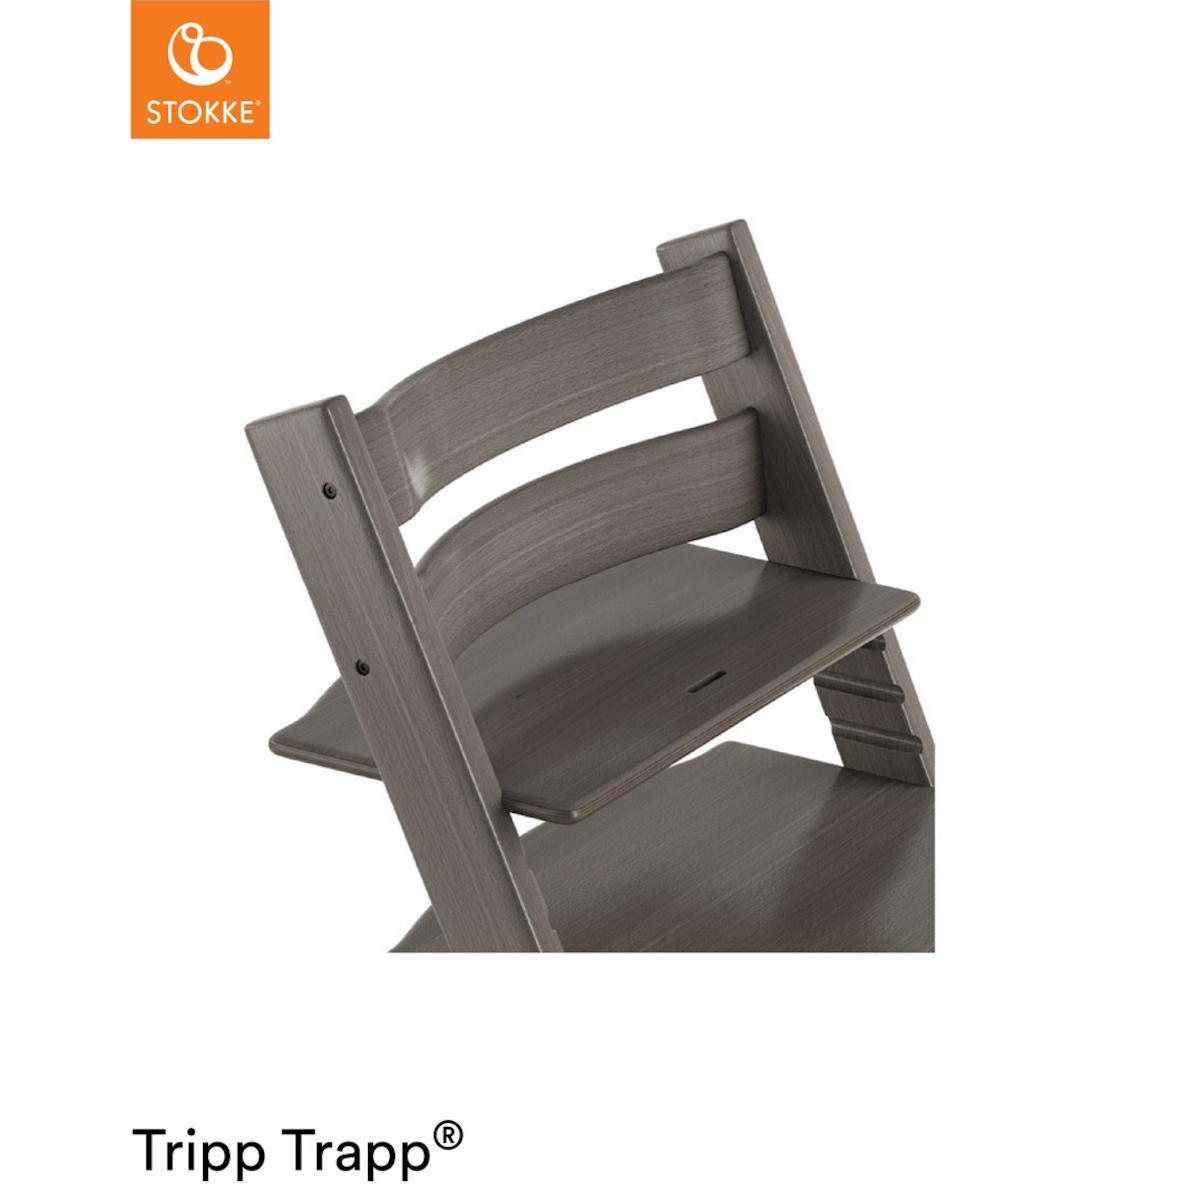 Trona bebé TRIPP TRAPP Stokke gris bruma